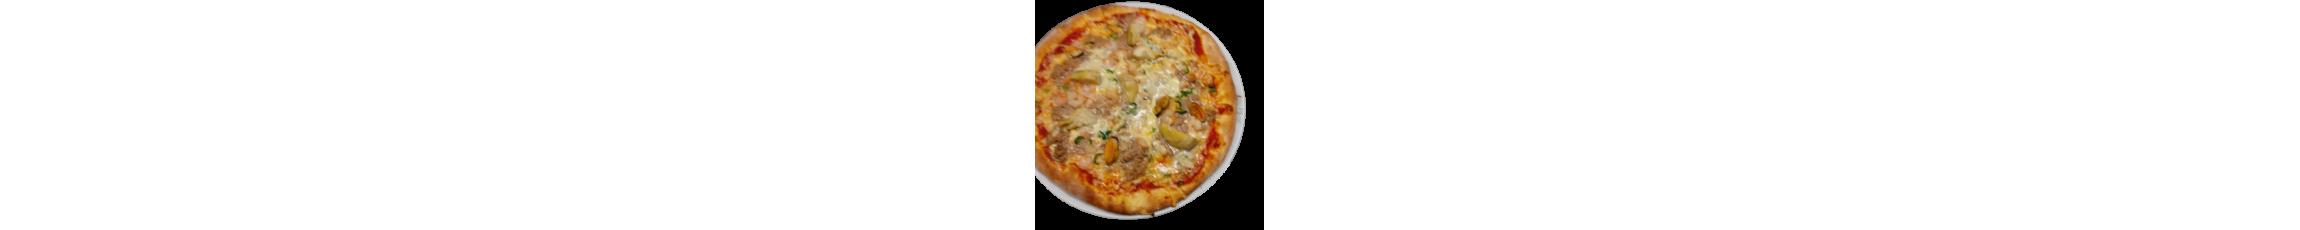 Vis pizza